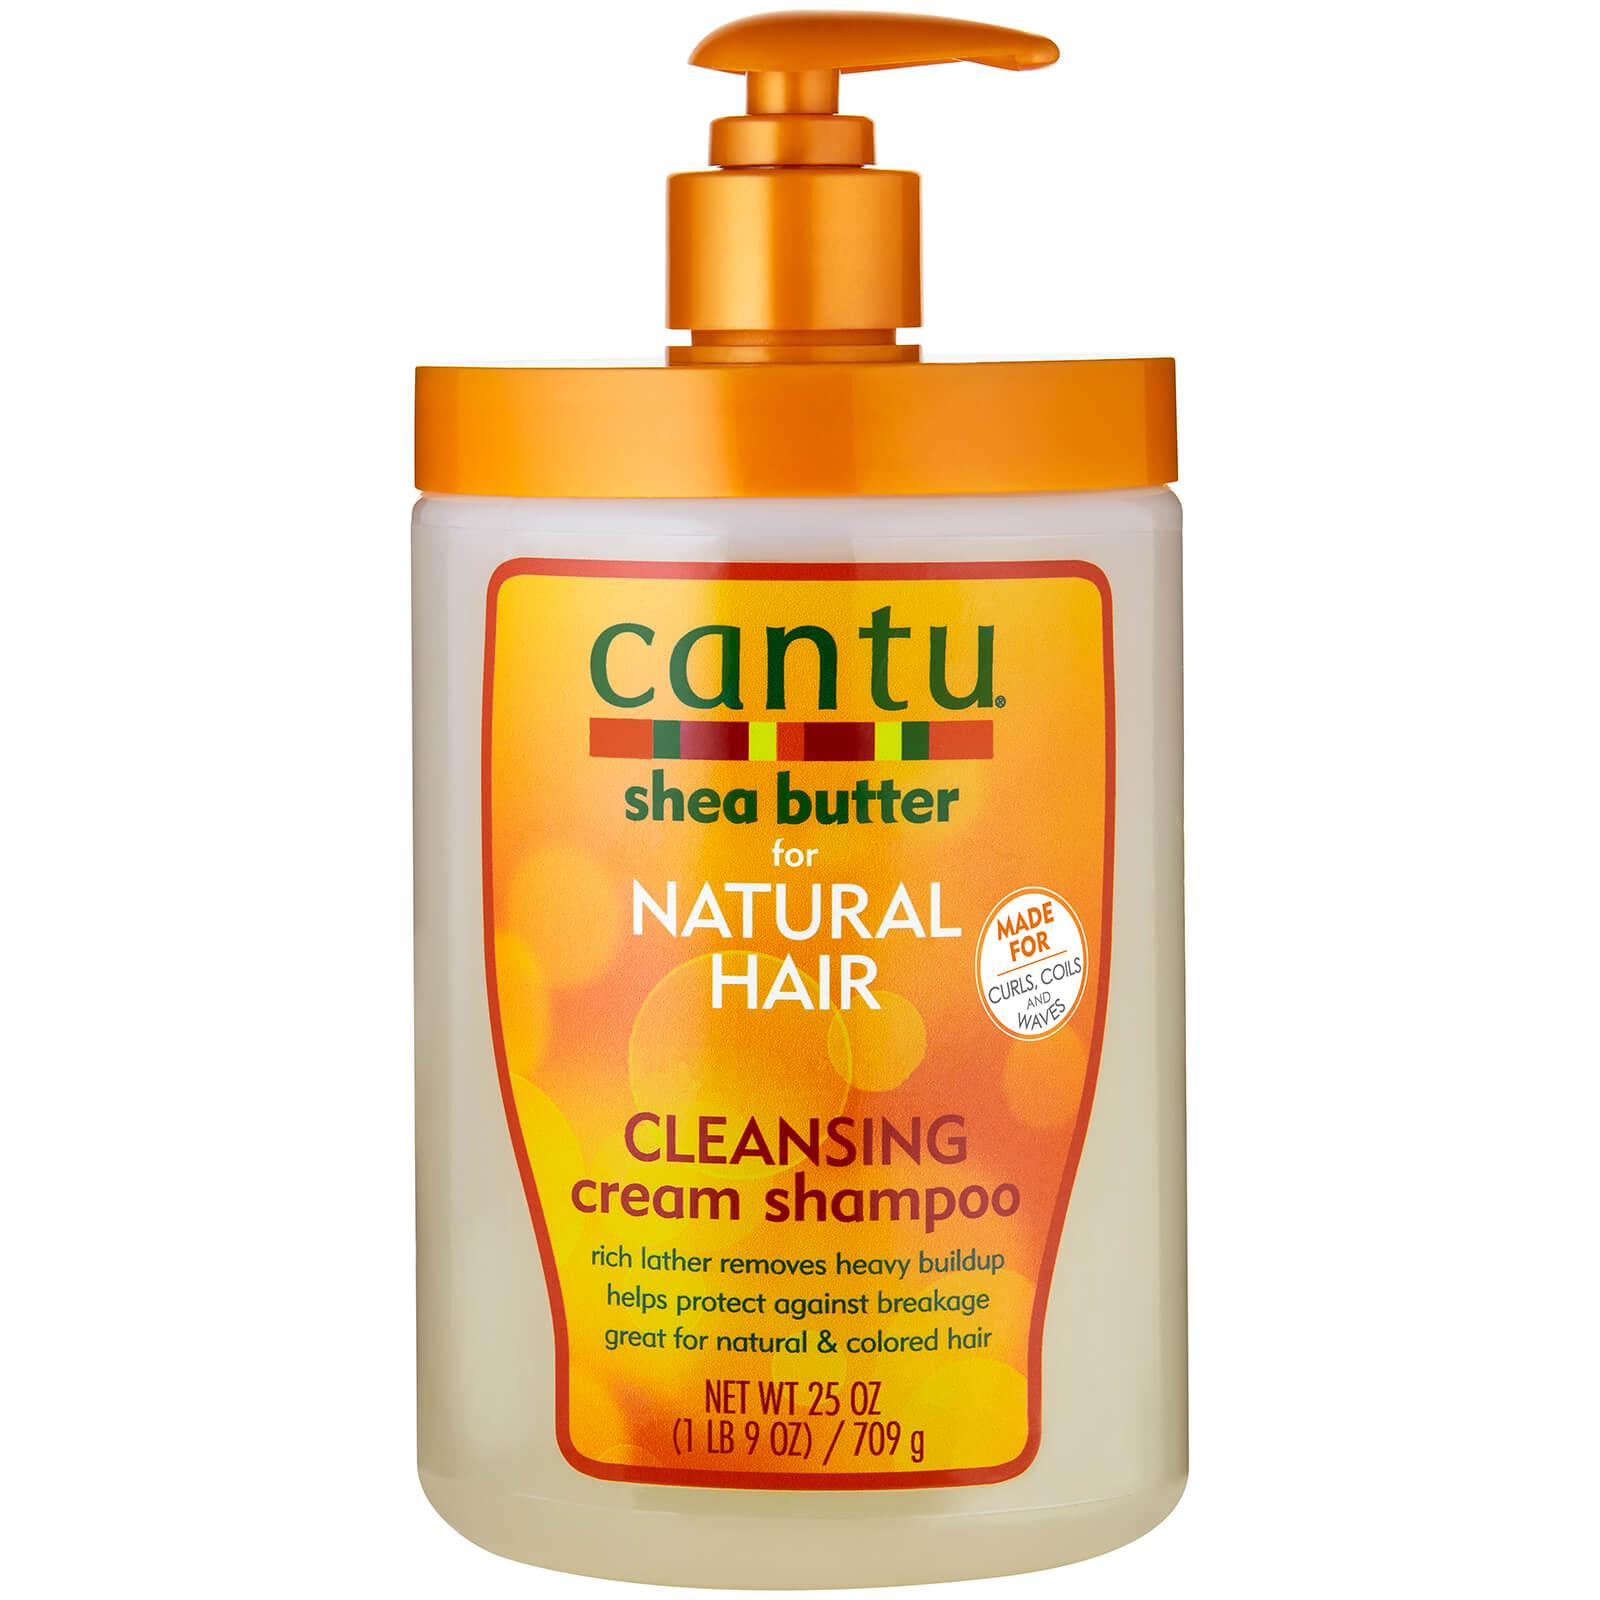 Cantu Shea Butter for Natural Hair Cleansing  Cream Shampoo 25oz